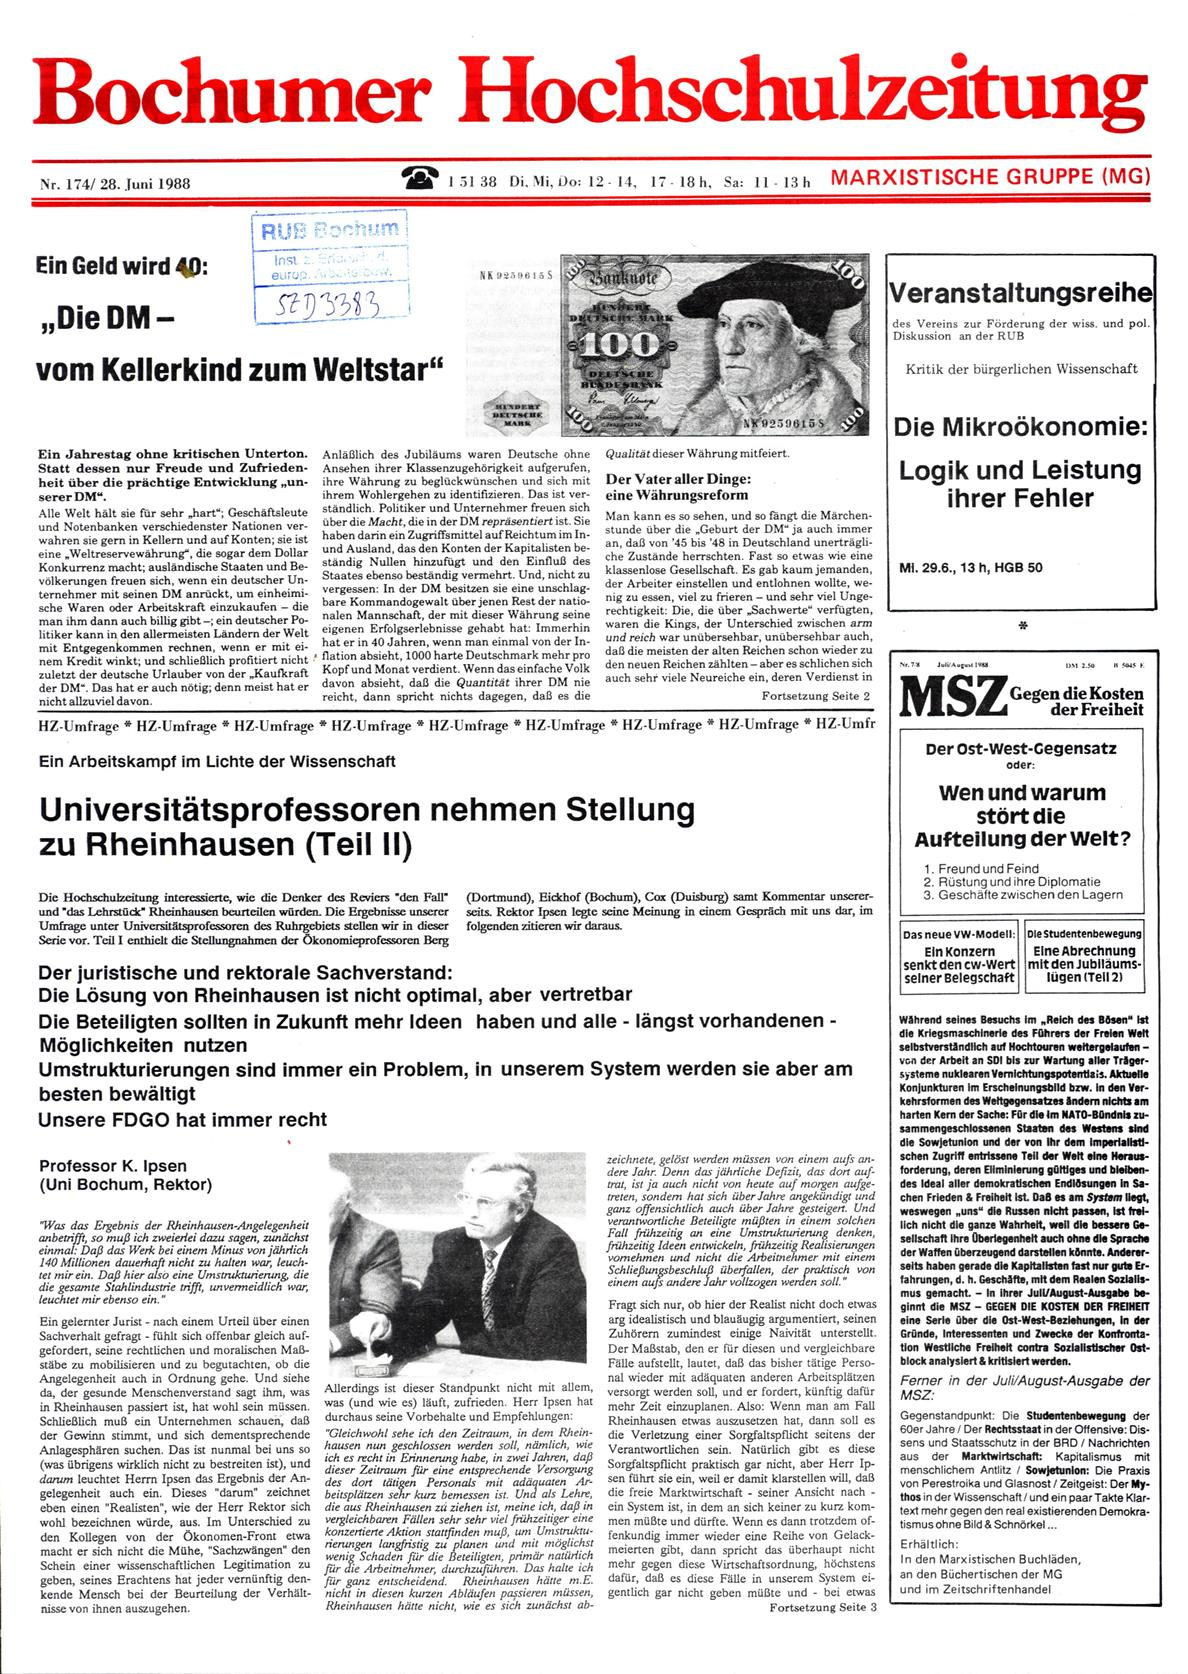 Bochum_BHZ_19880628_174_001